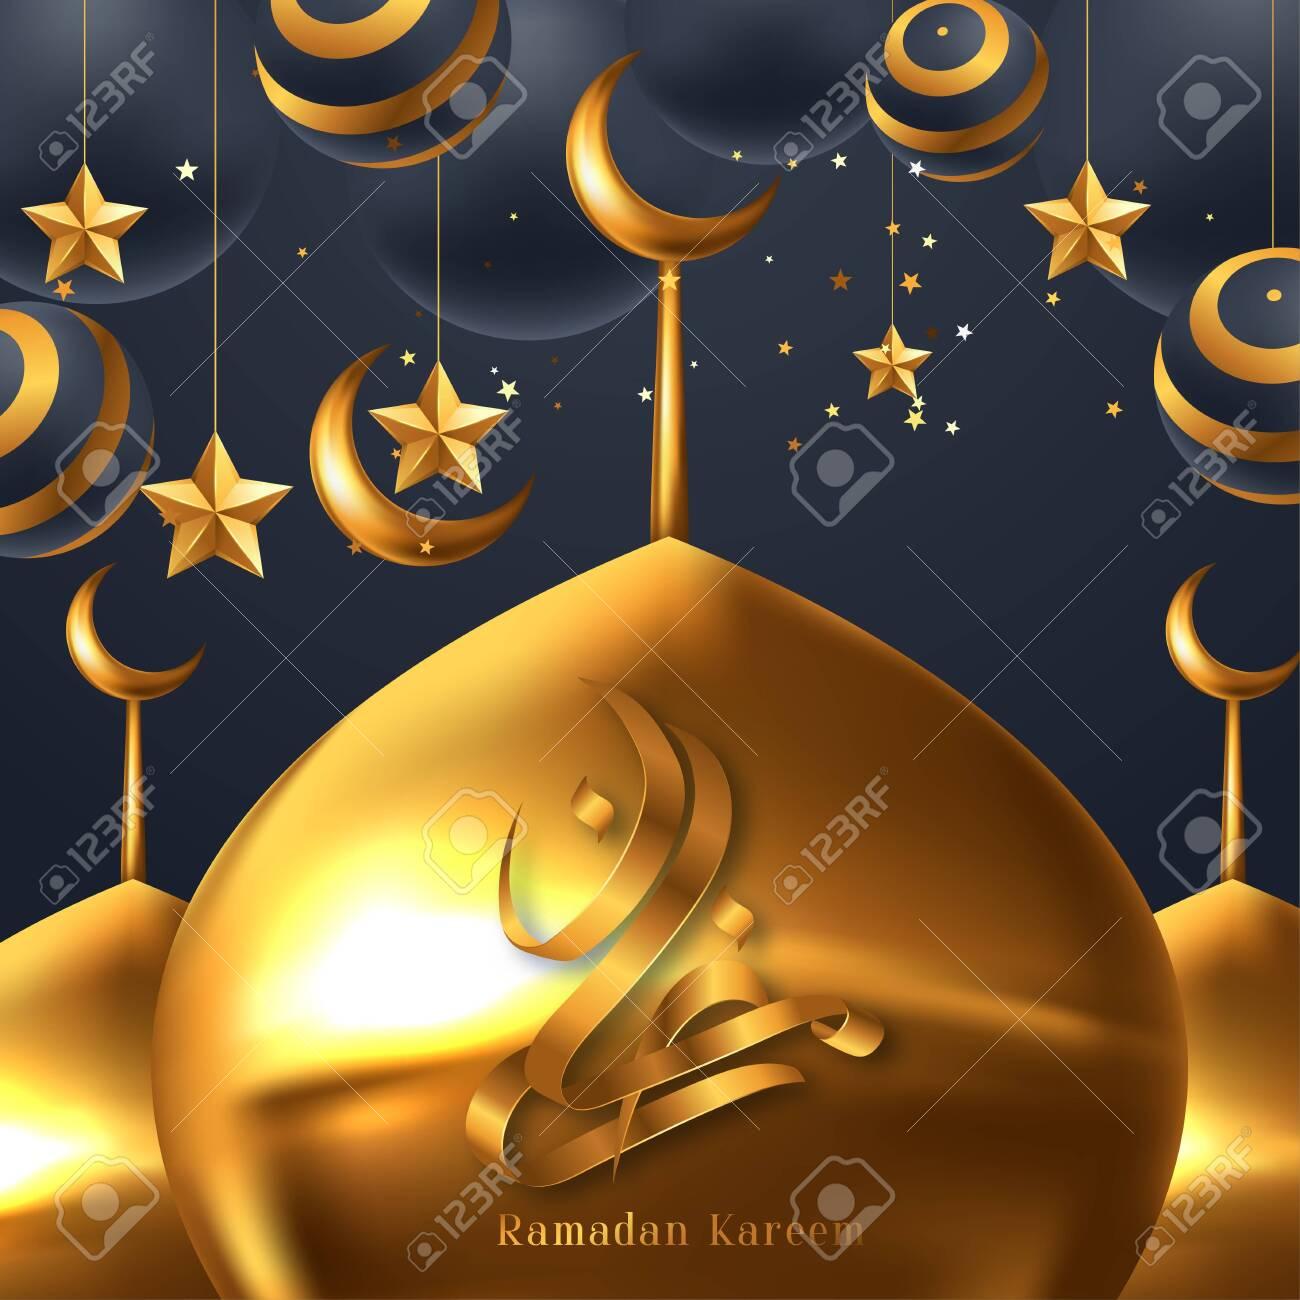 Ramadan kareem poster, golden Arabic calligraphy design. Vector illustrator - 143836980